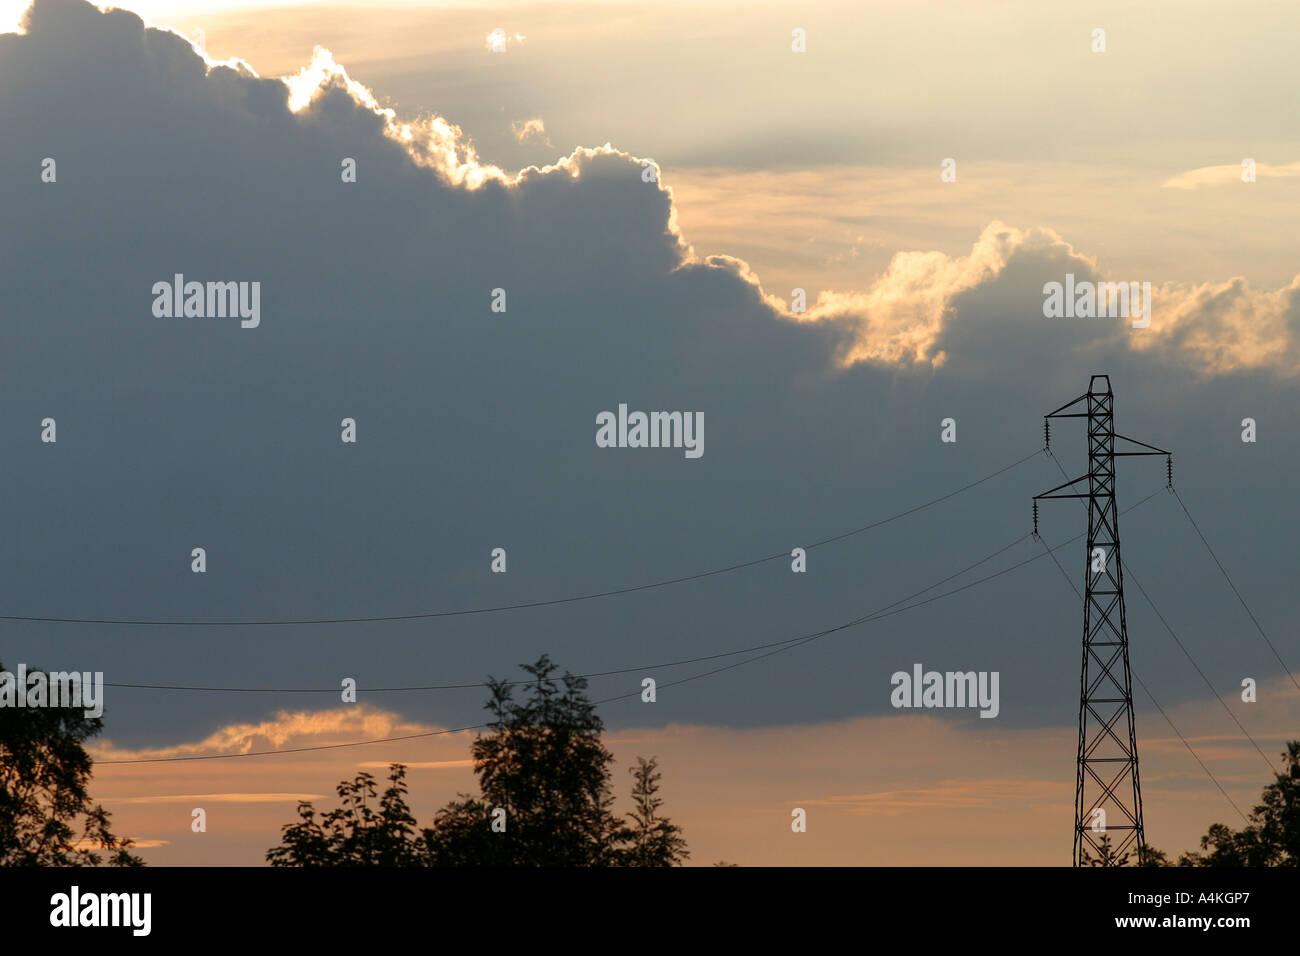 Pylon and cloudscape - Stock Image